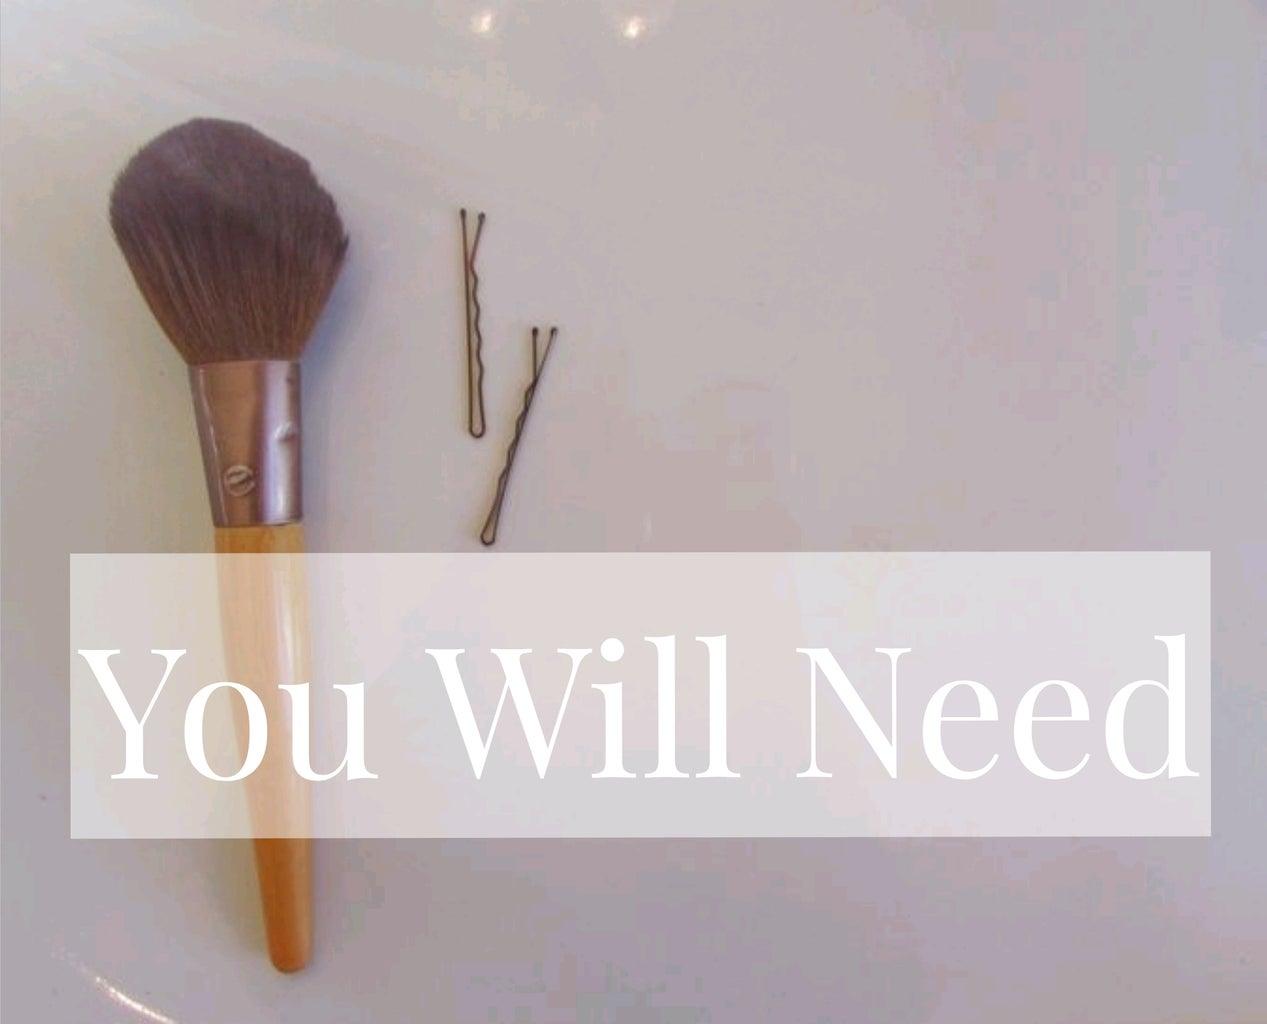 Fanned Make Up Brush